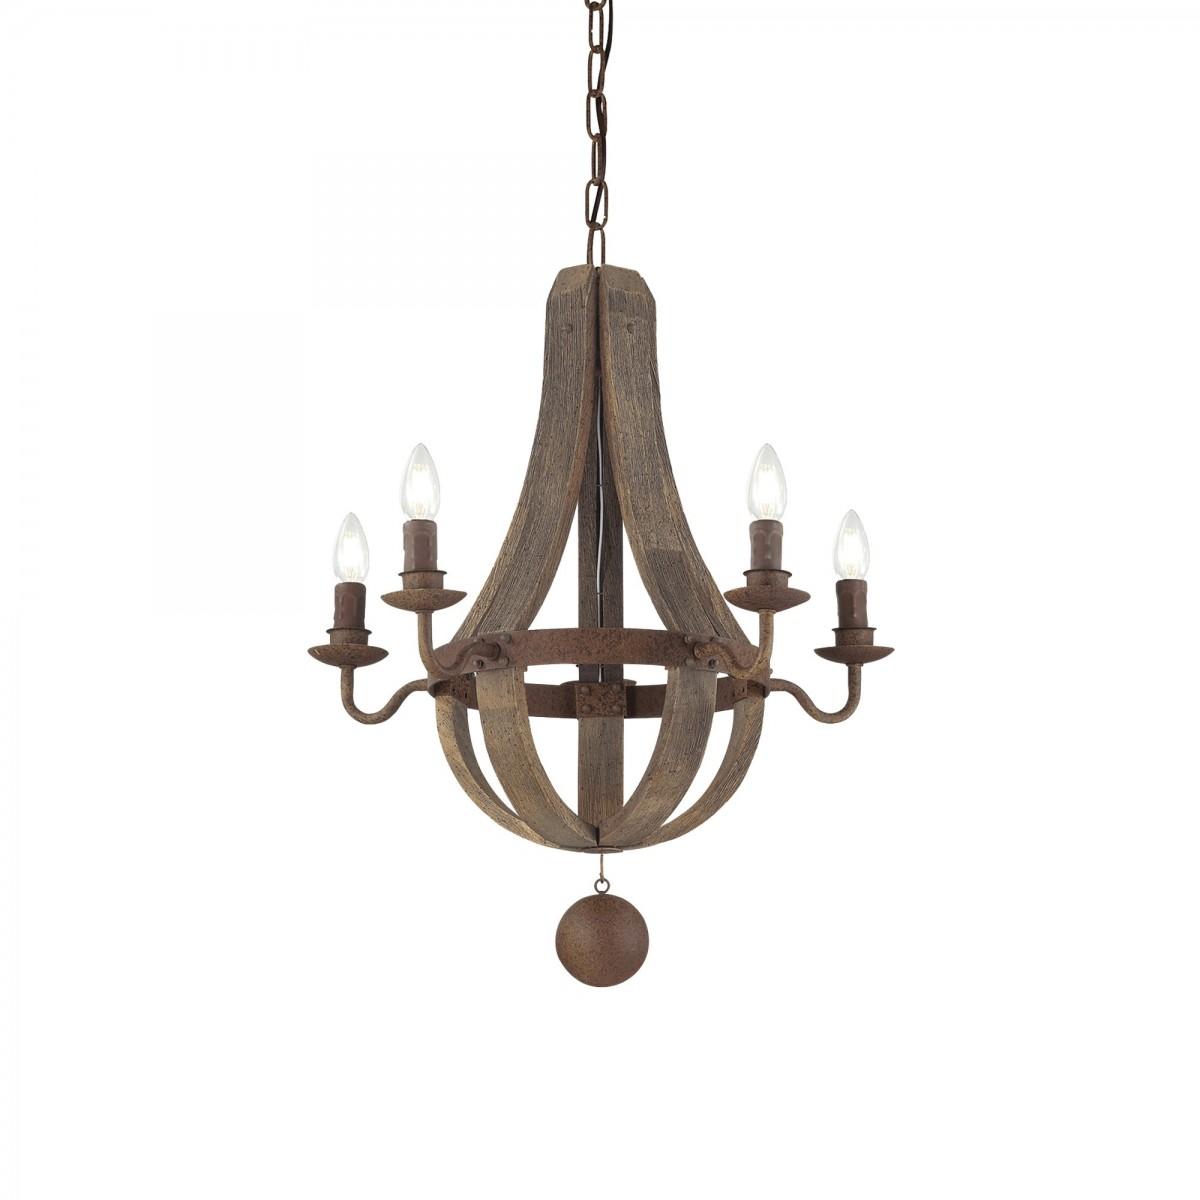 závěsný lustr Ideal Lux Millennium SP5 129921 5x40W E14 - monumentální osvětlení